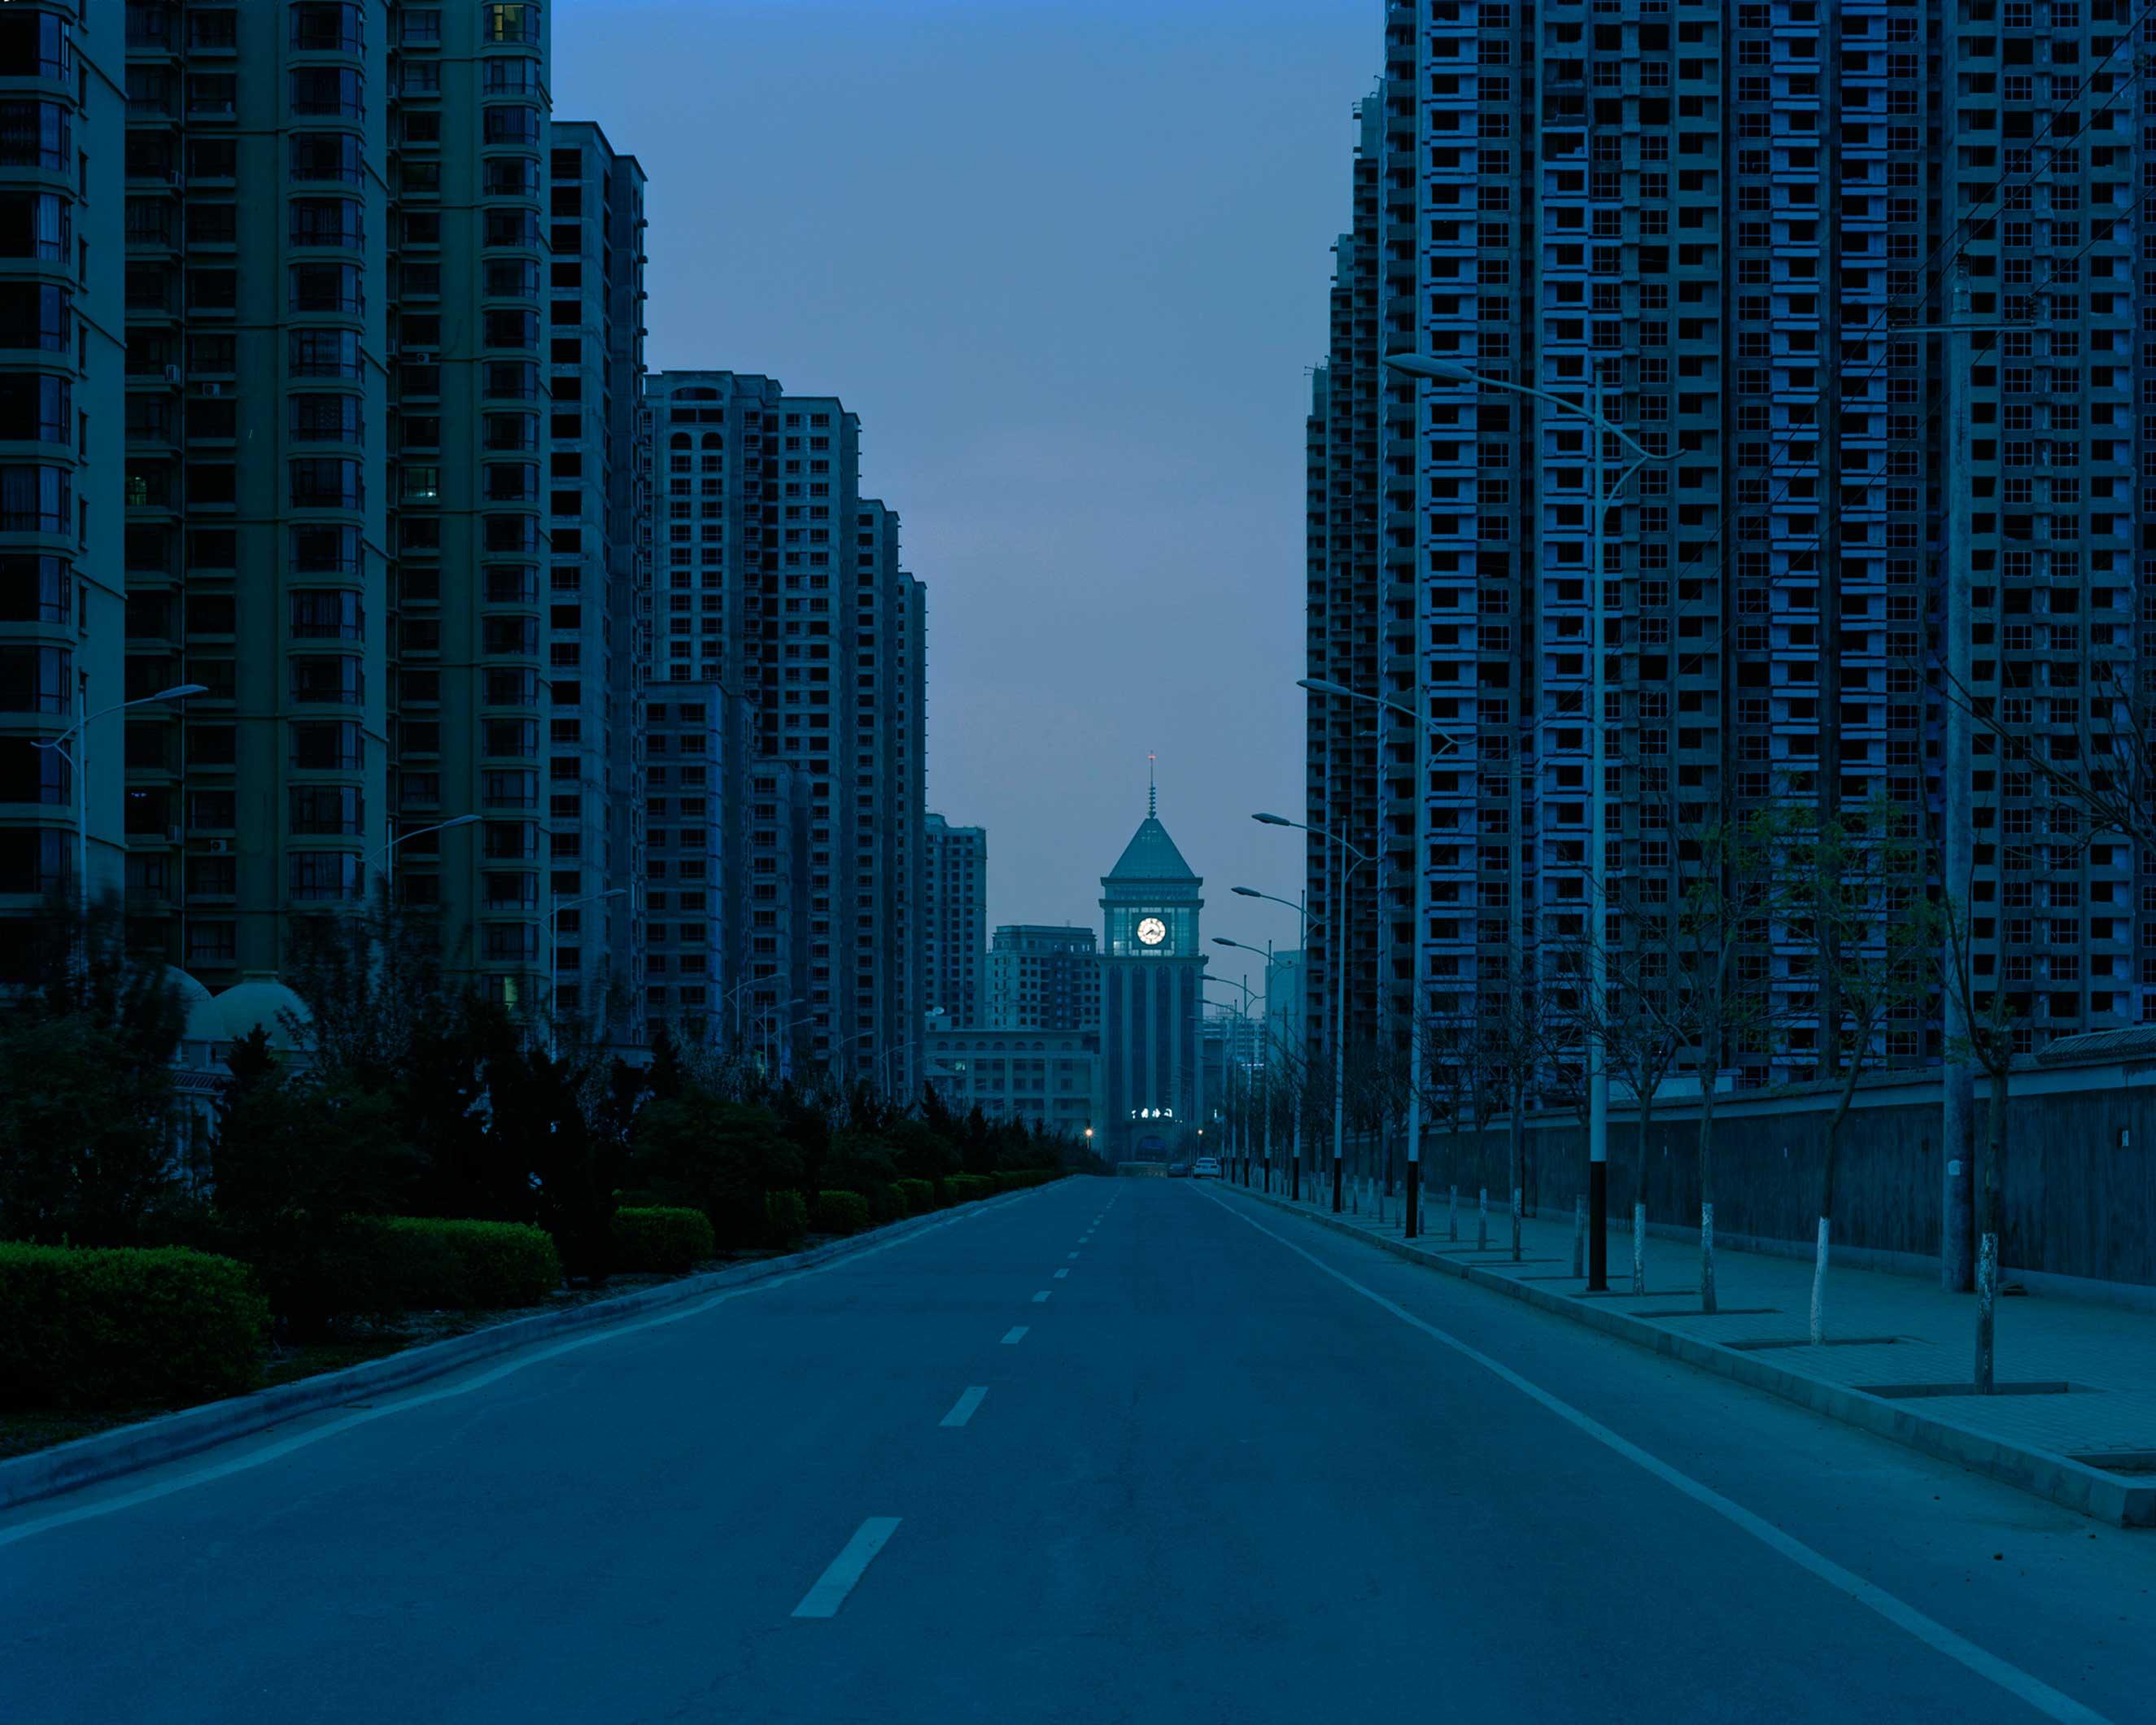 Lanzhou, Anning district, Gansu province, China, April 2013